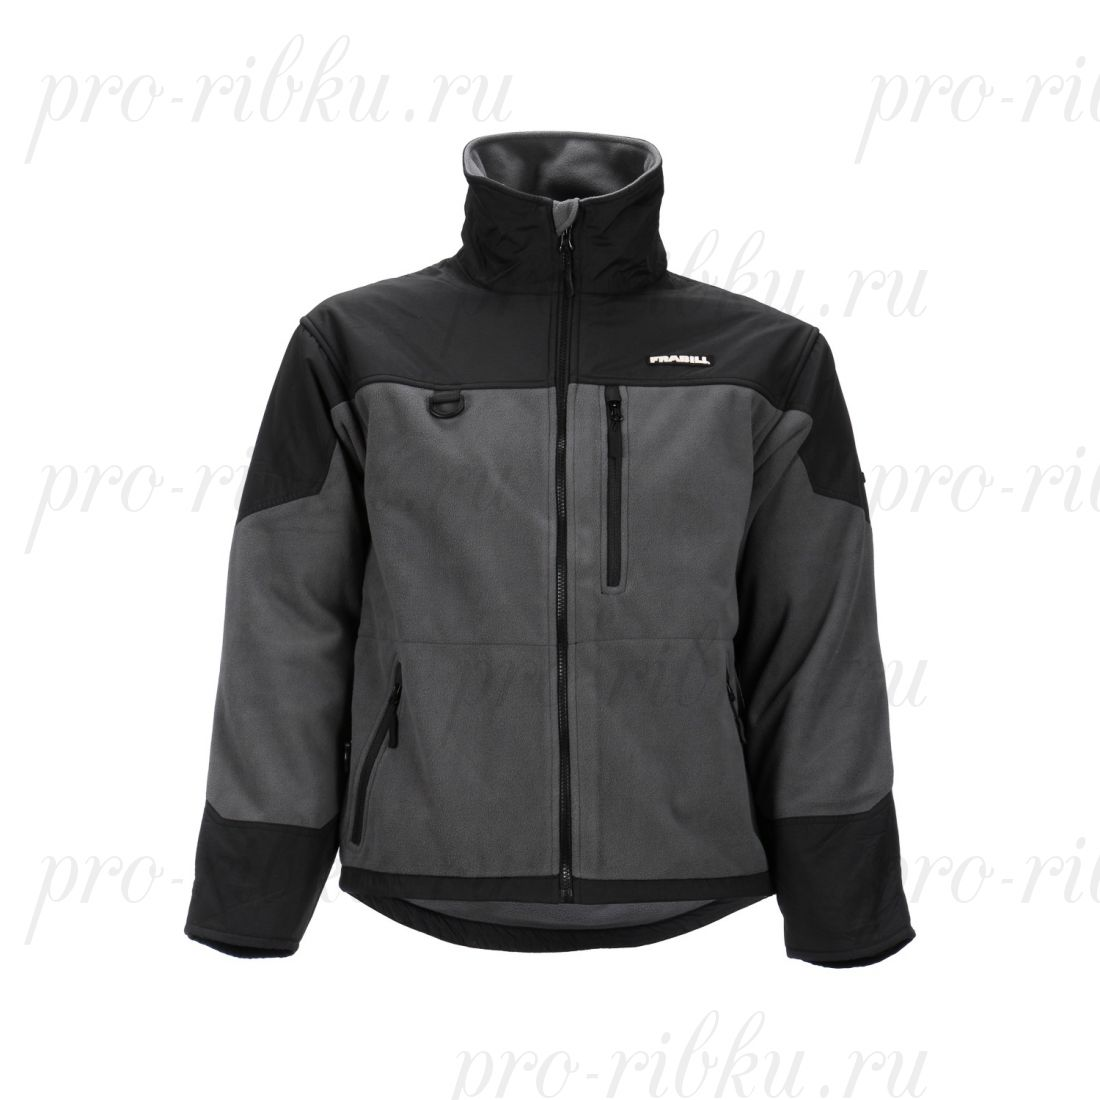 Куртка флисовая Frabill FXE WINDPROOF FLEECE Jacket размер 3XL